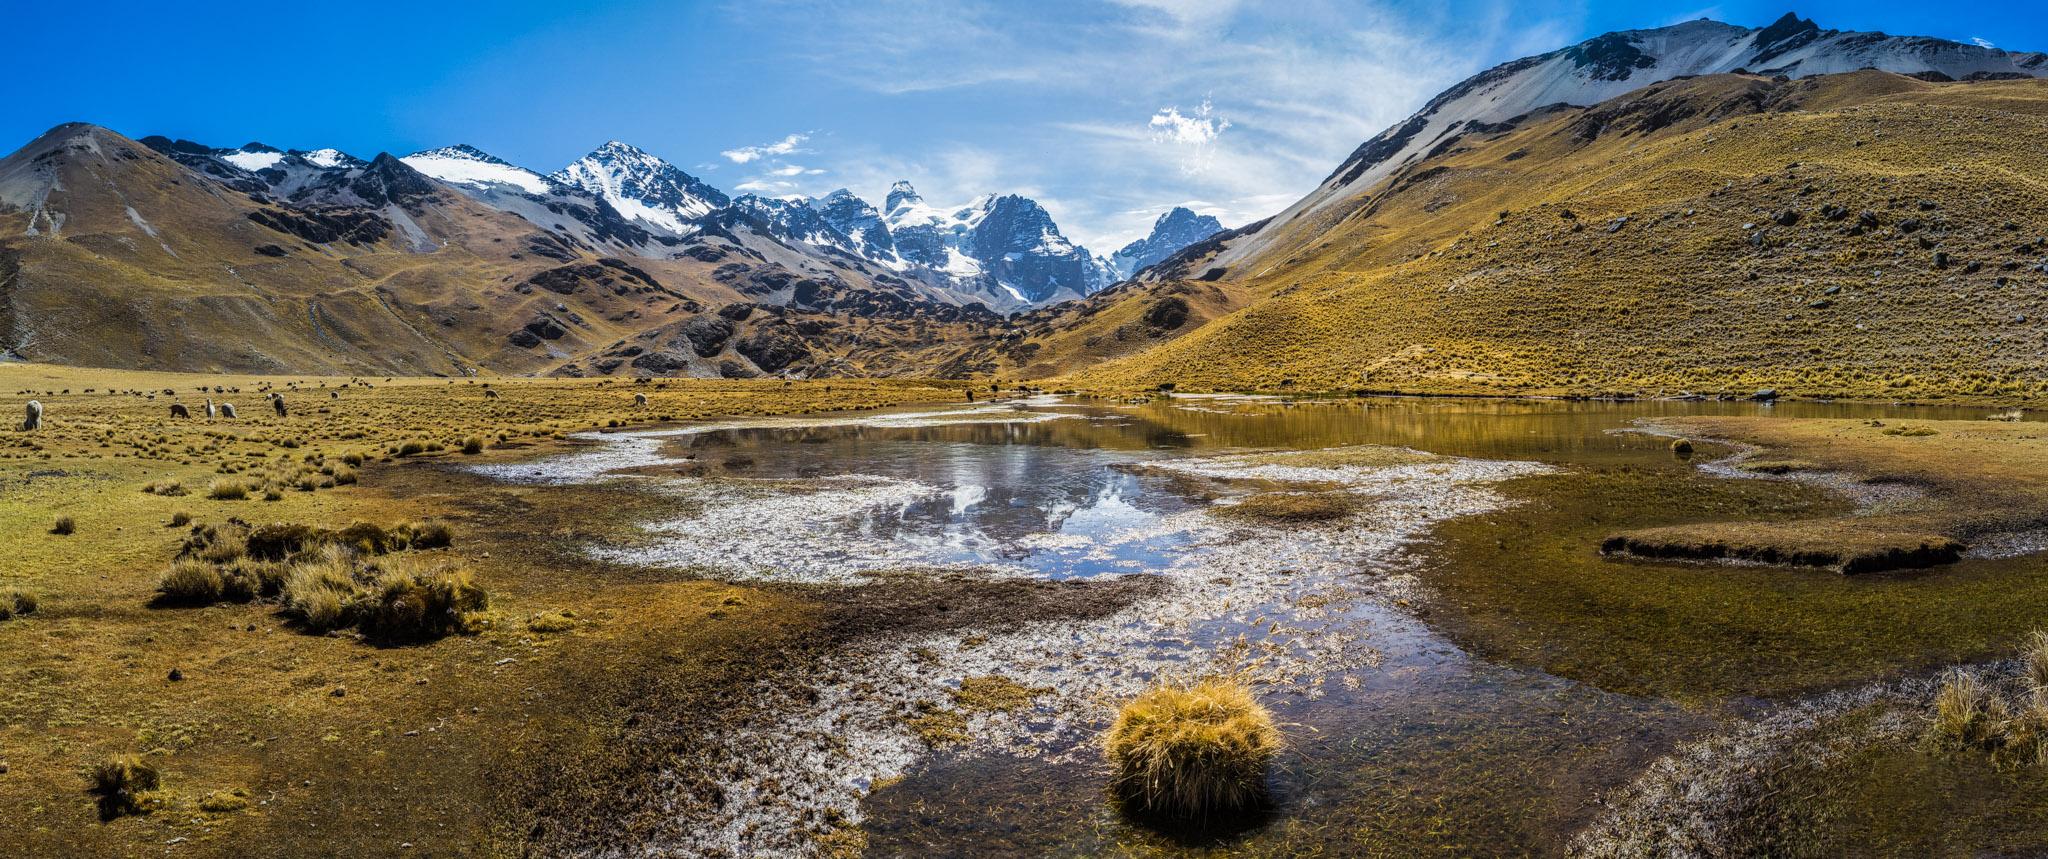 Ali-Barqawi-Studios-Explore-Series-Travel-Adventure-Documentary-C4CGAZA-Bolivia-Mount-Tarija-2015-263.jpg